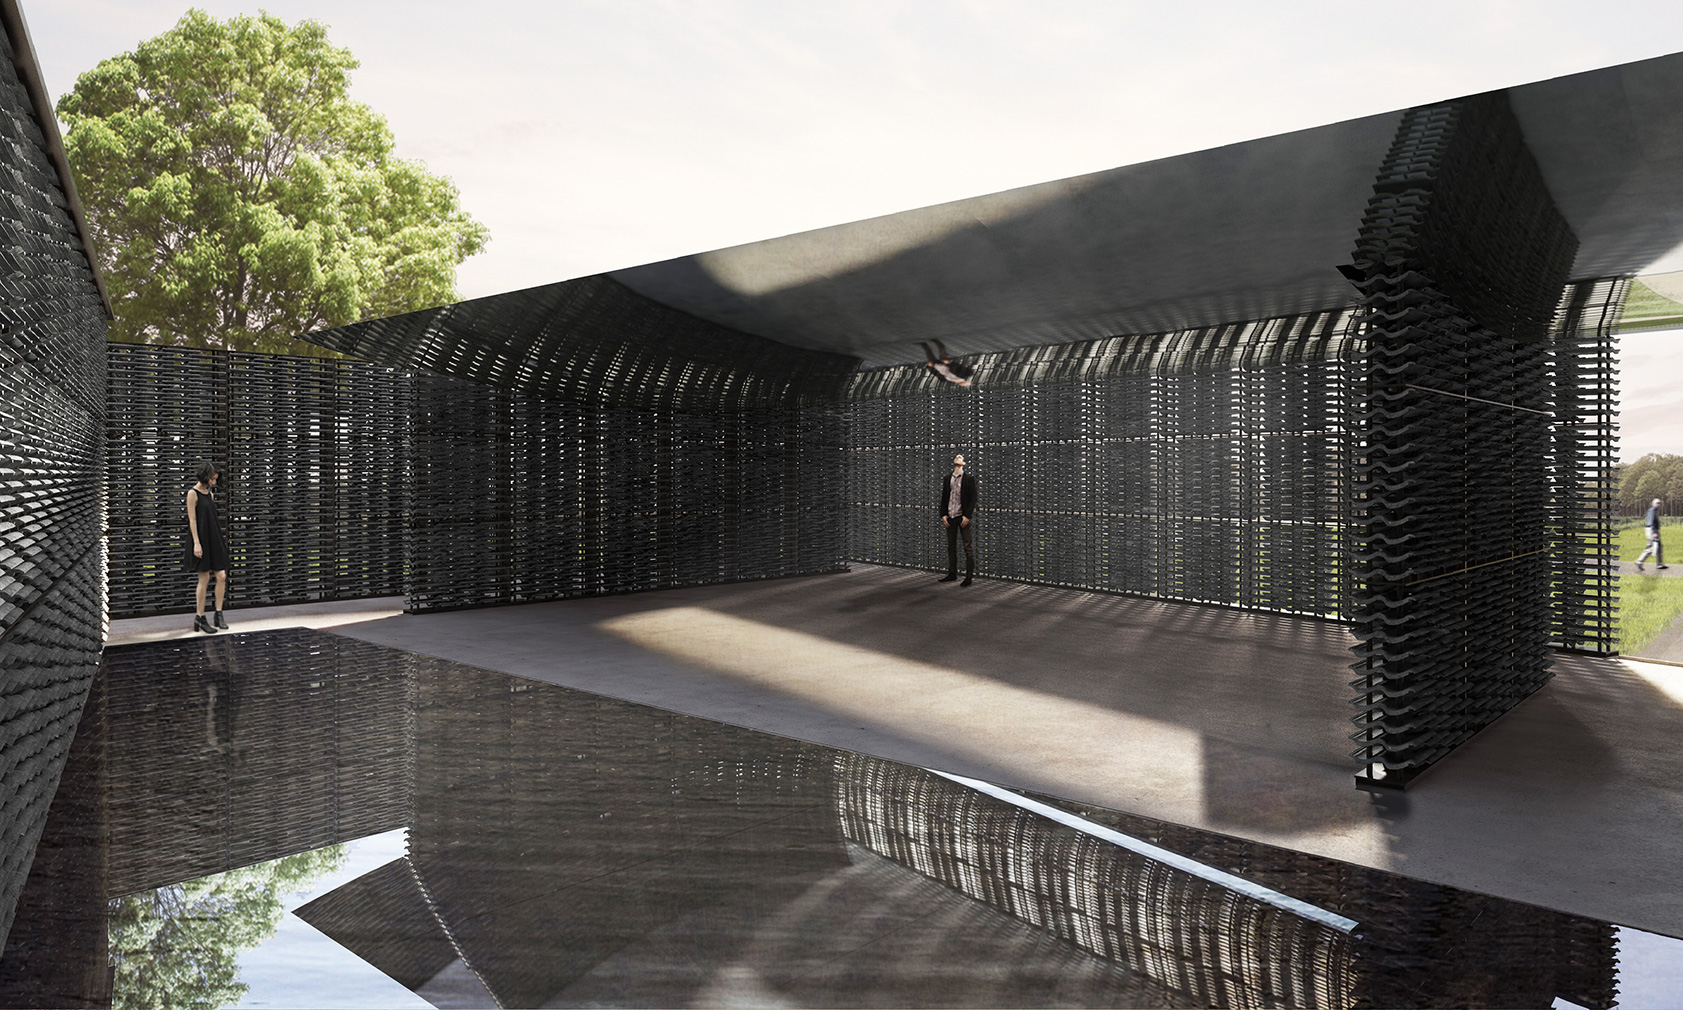 Serpentine Pavilion 2018 designed by Frida Escobedo, Taller de Arquitectura, interior view © Frida Escobedo, Taller de Arquitectura. Renderings by Atmósfera